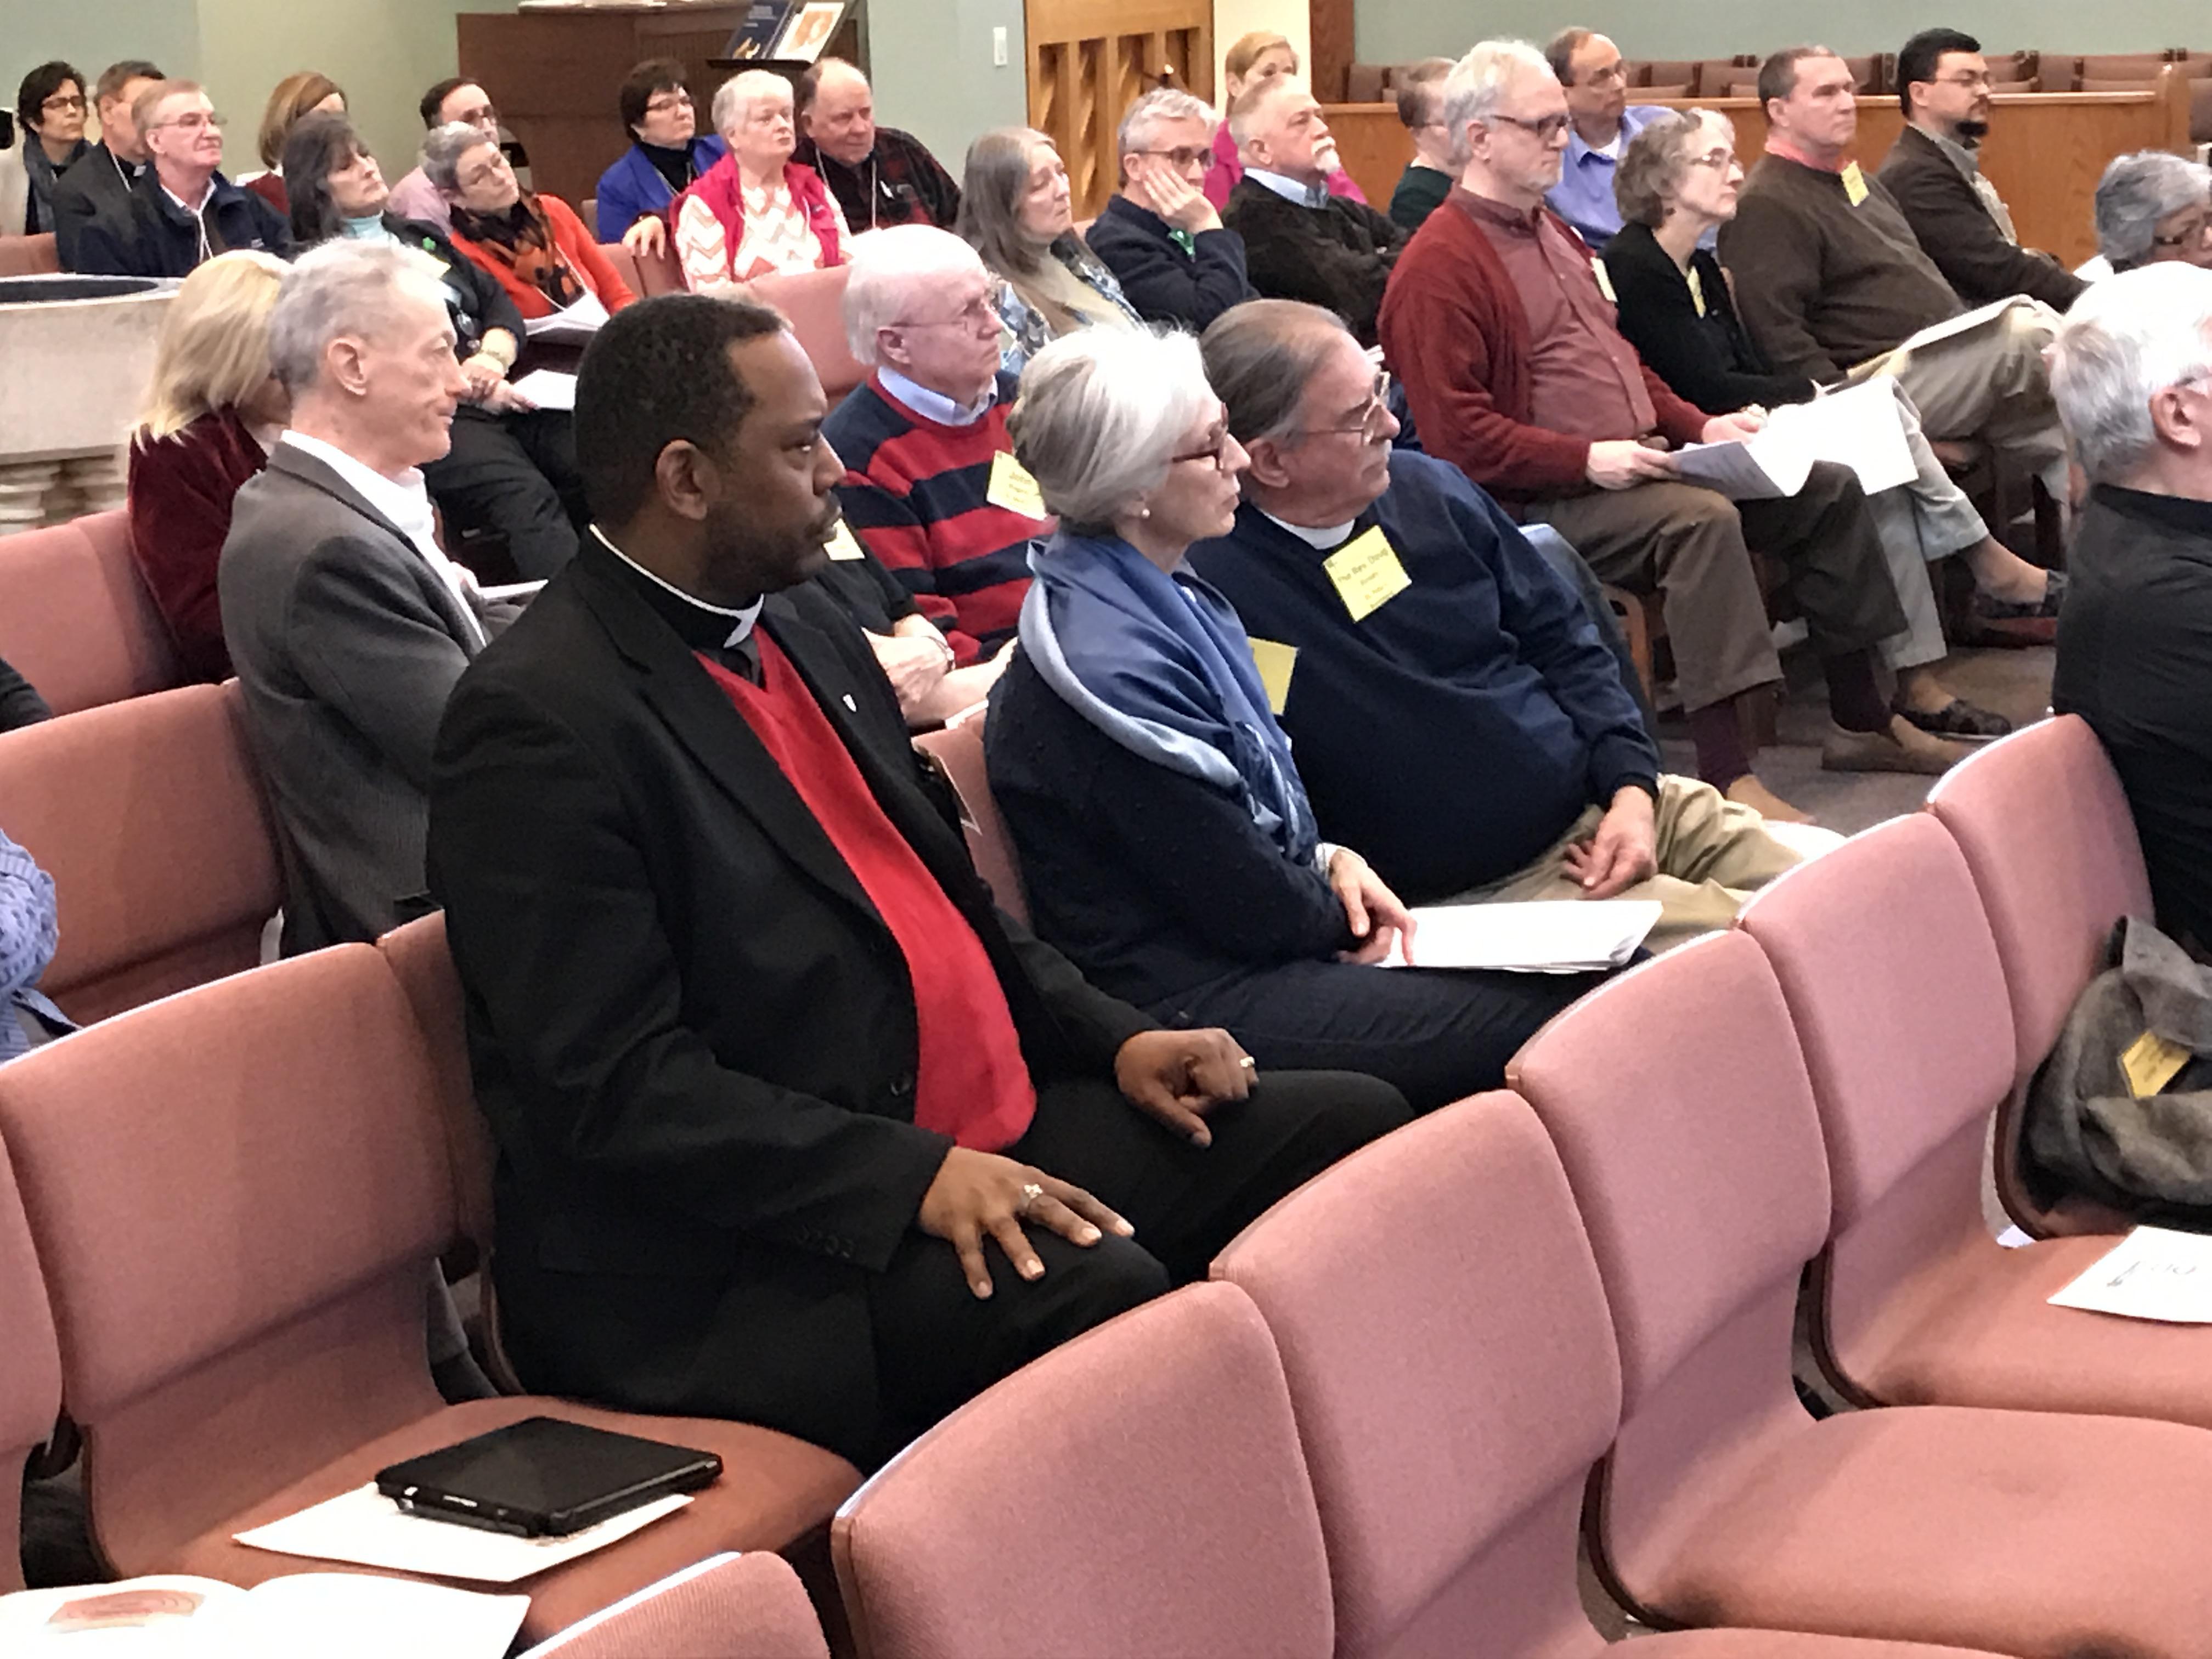 Evangelism Conf 2017 - Group 2